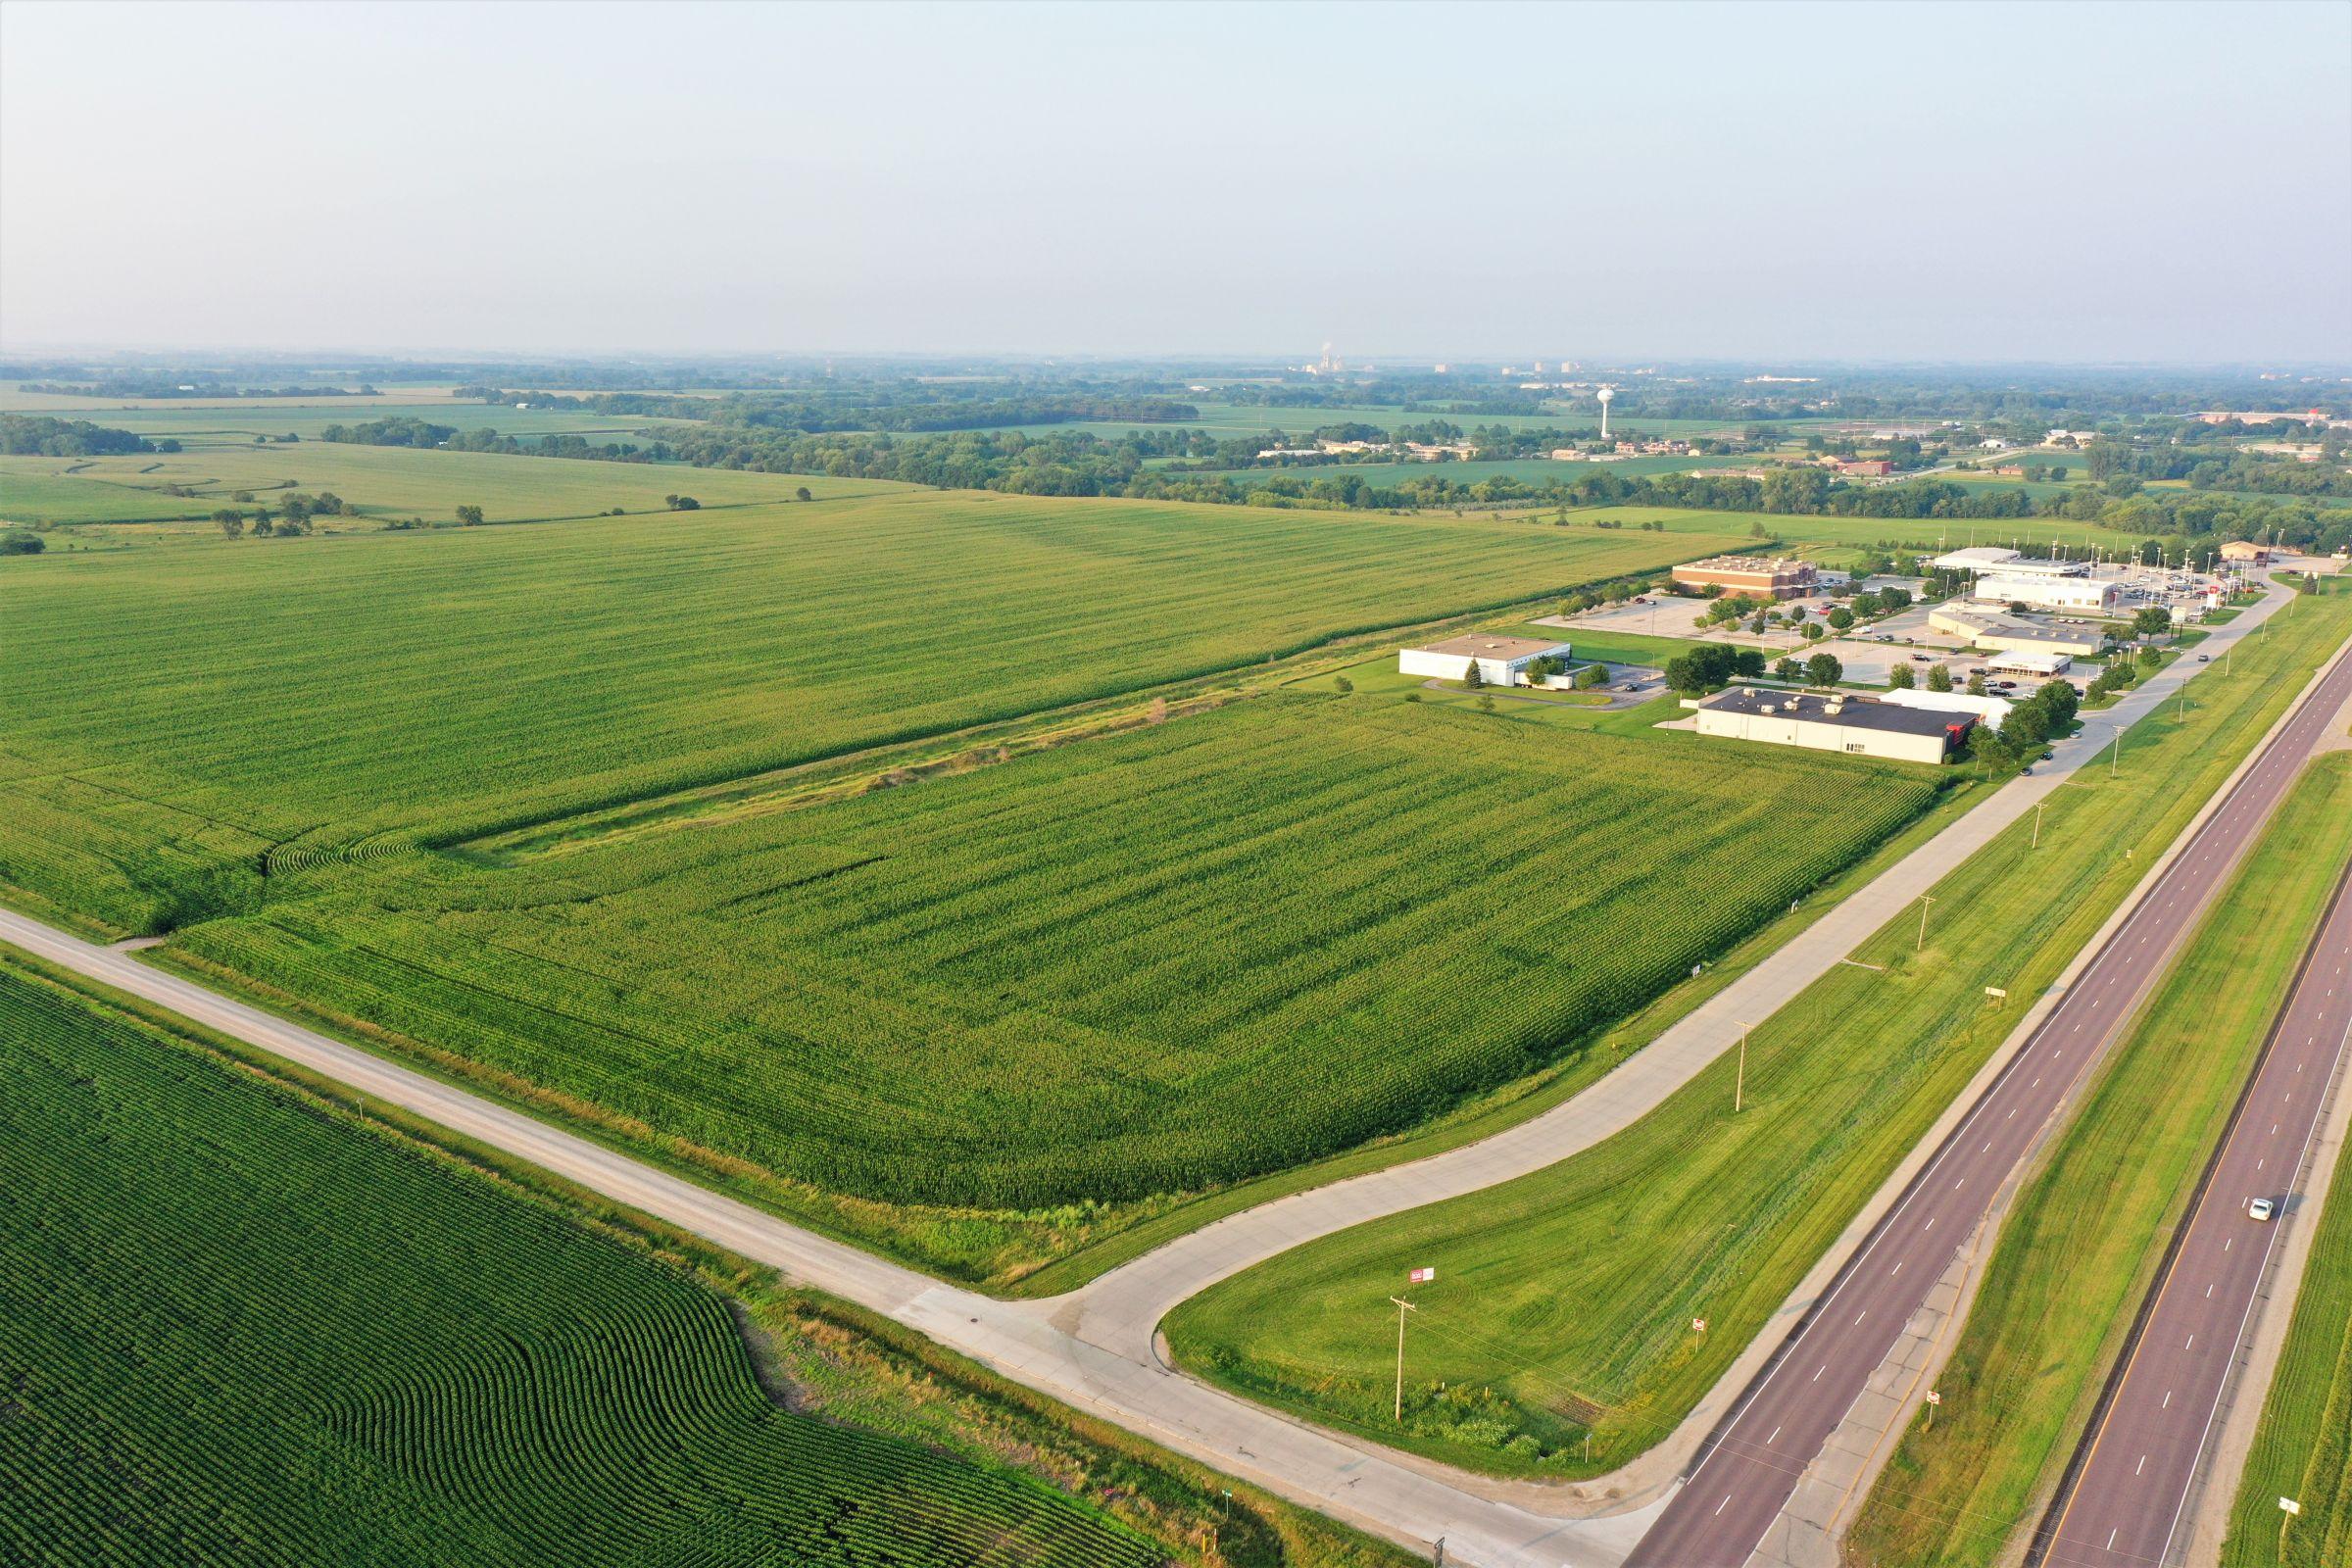 development-land-commercial-cerro-gordo-county-iowa-2-acres-listing-number-15643-3-2021-07-19-140940.jpg